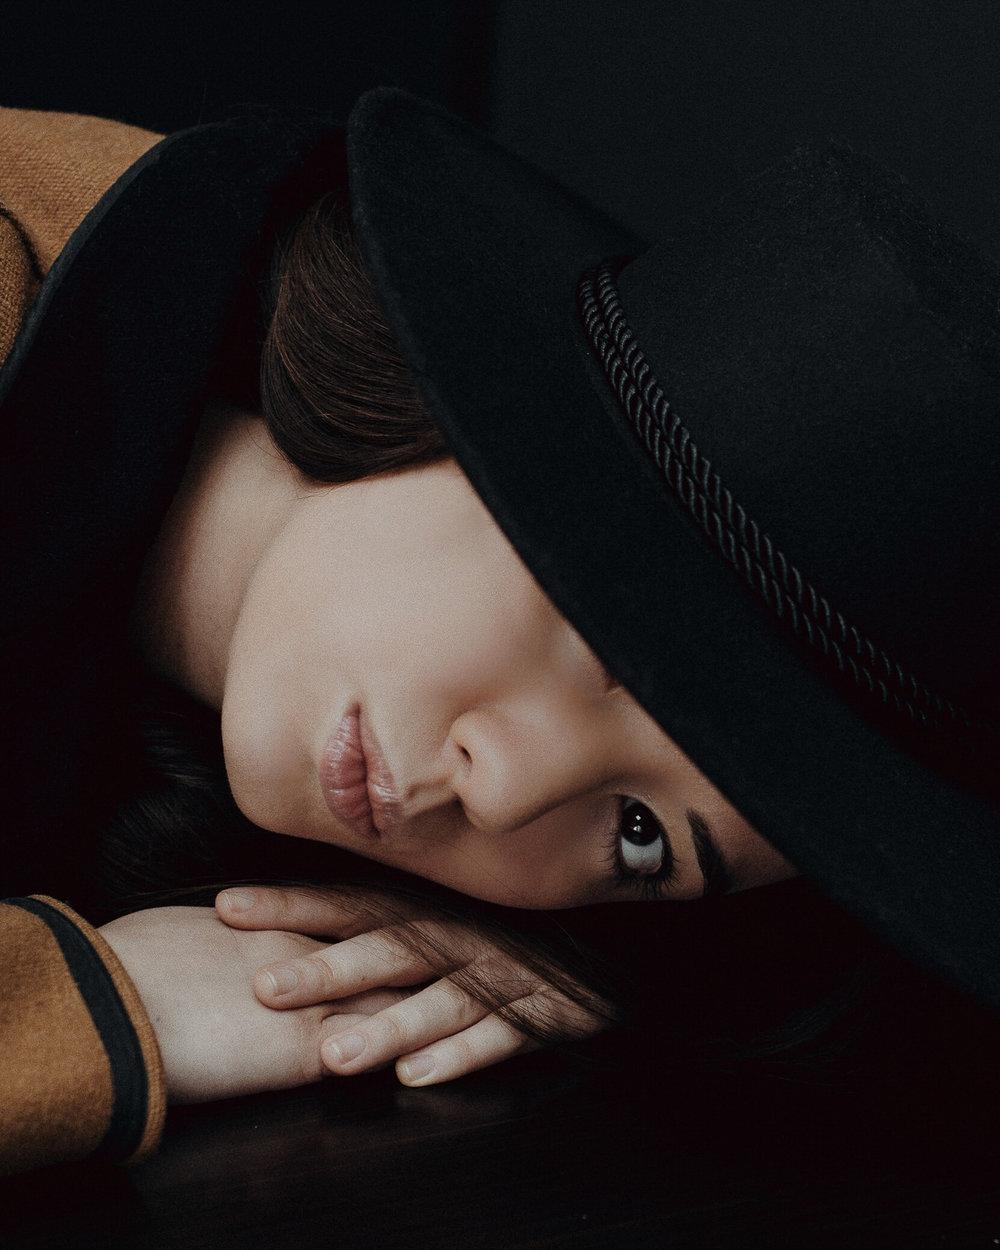 portland editorial fashion portrait photographer miranda kelton photography